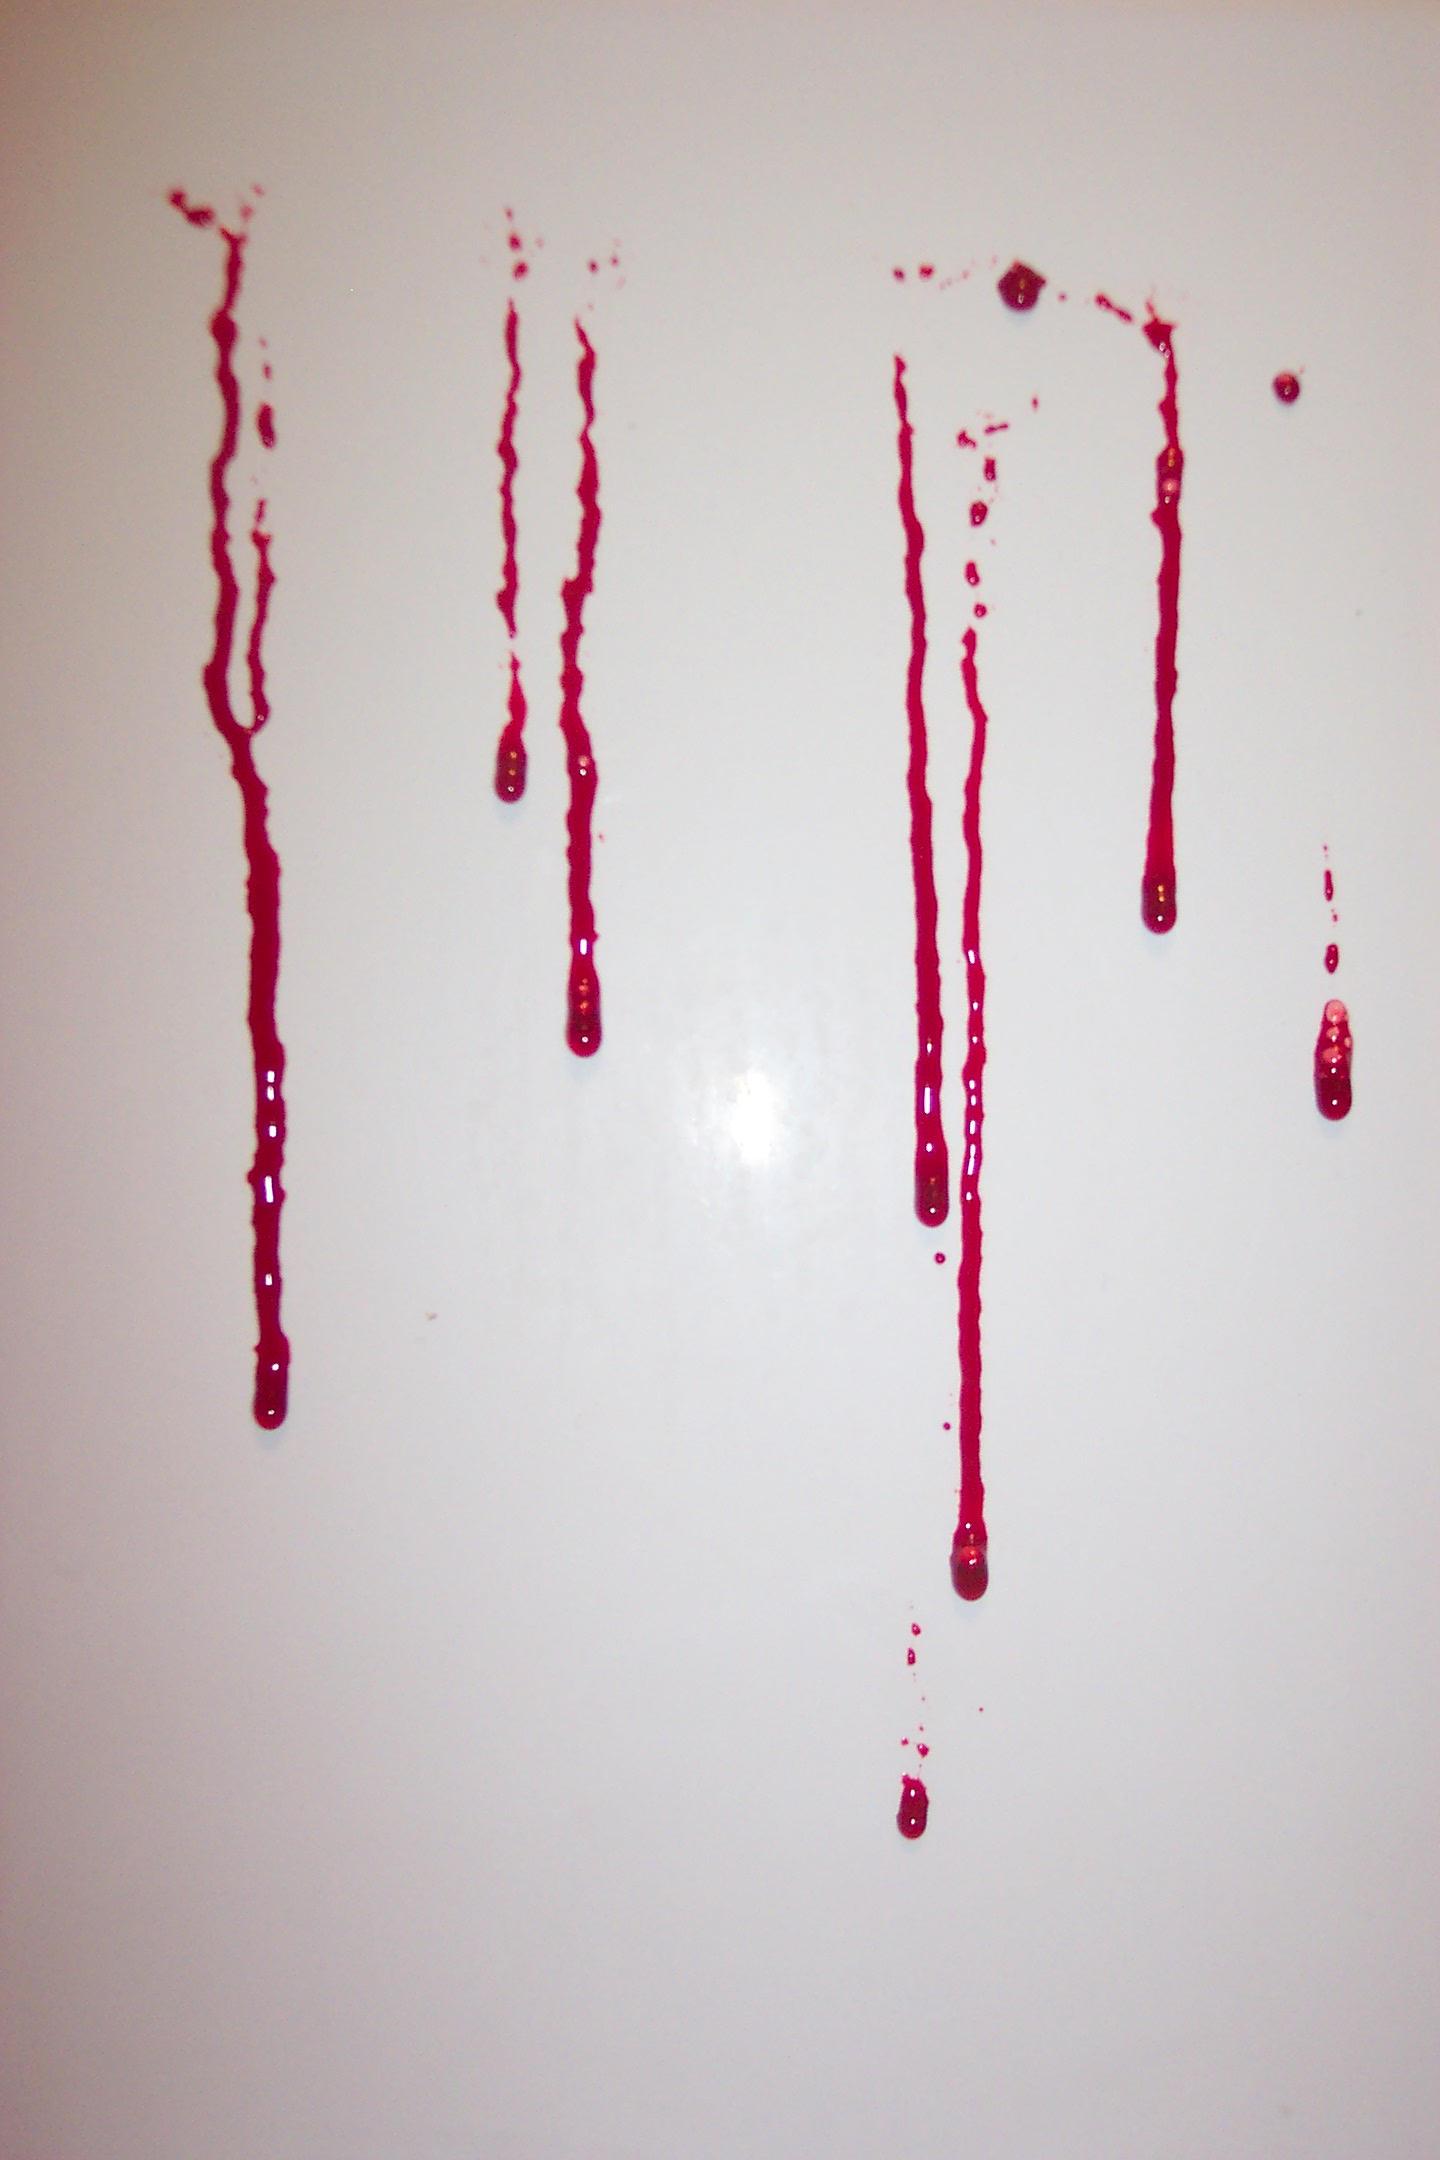 Blood splatter gif tumblr